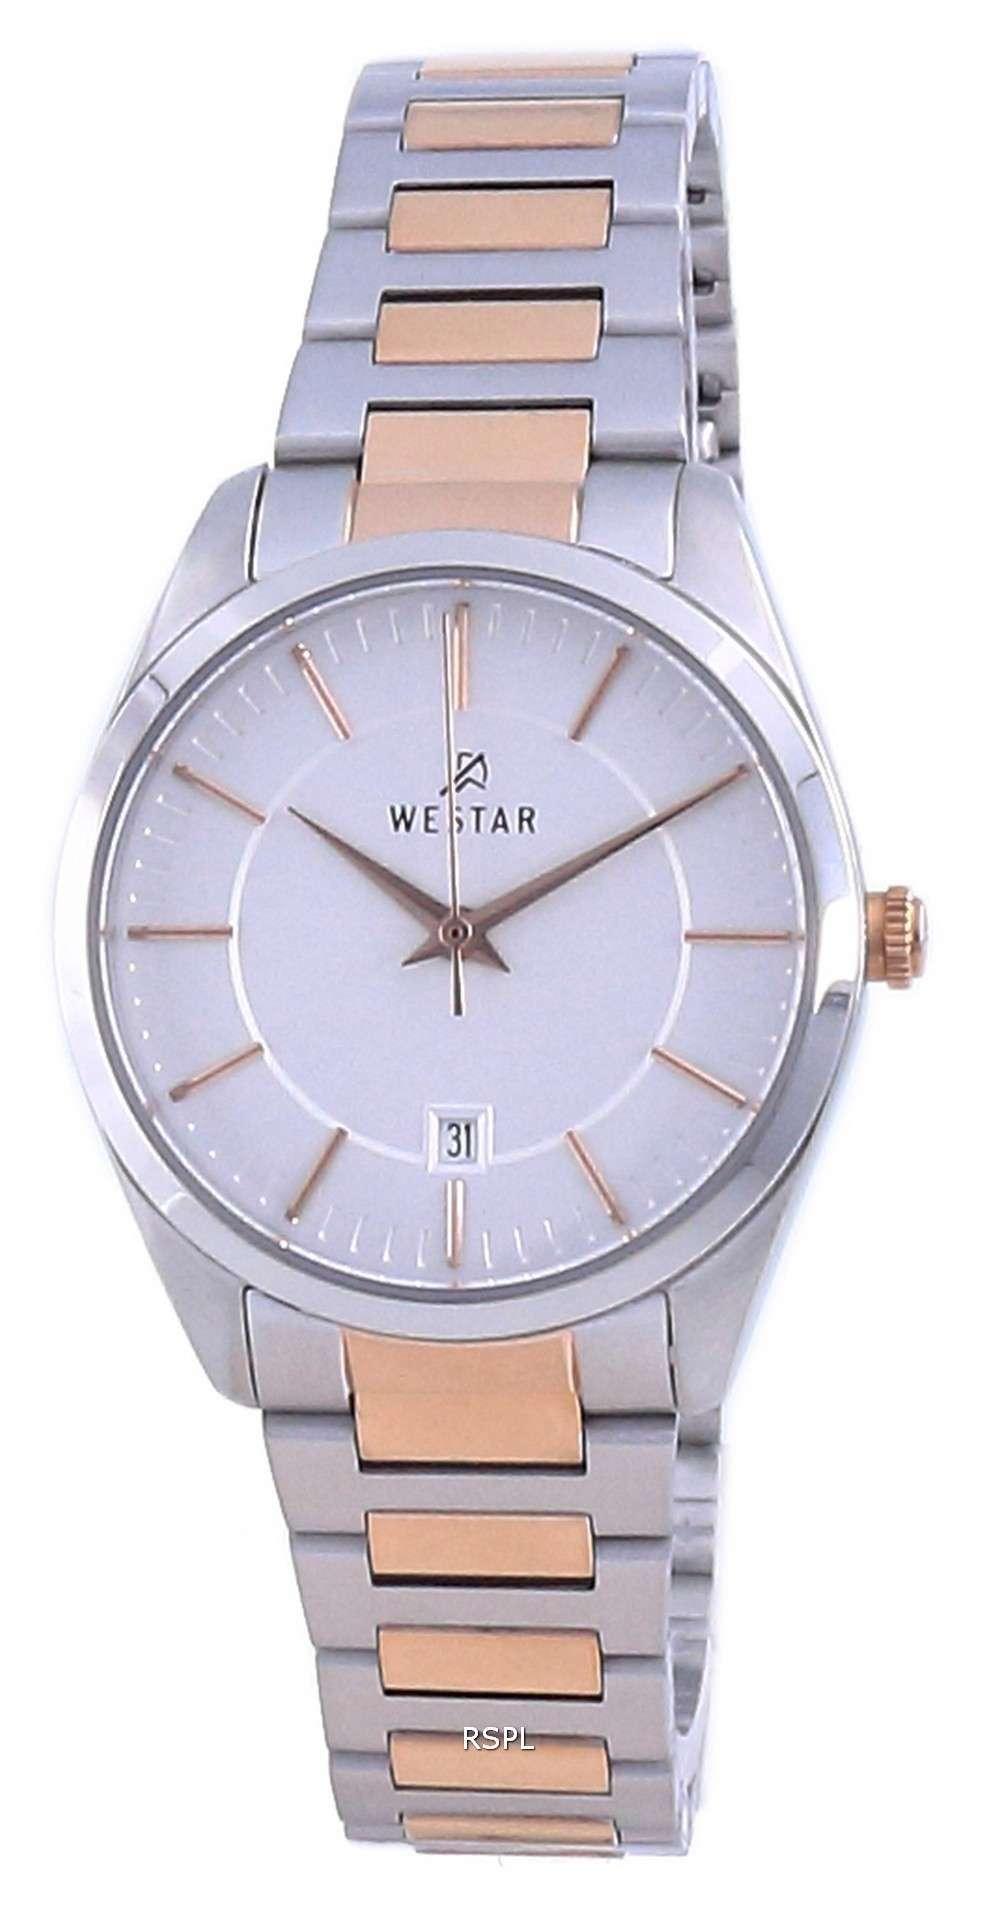 Westar Silver Dial Two Tone Stainless Steel Quartz 40213 SPN 607 Reloj para mujer